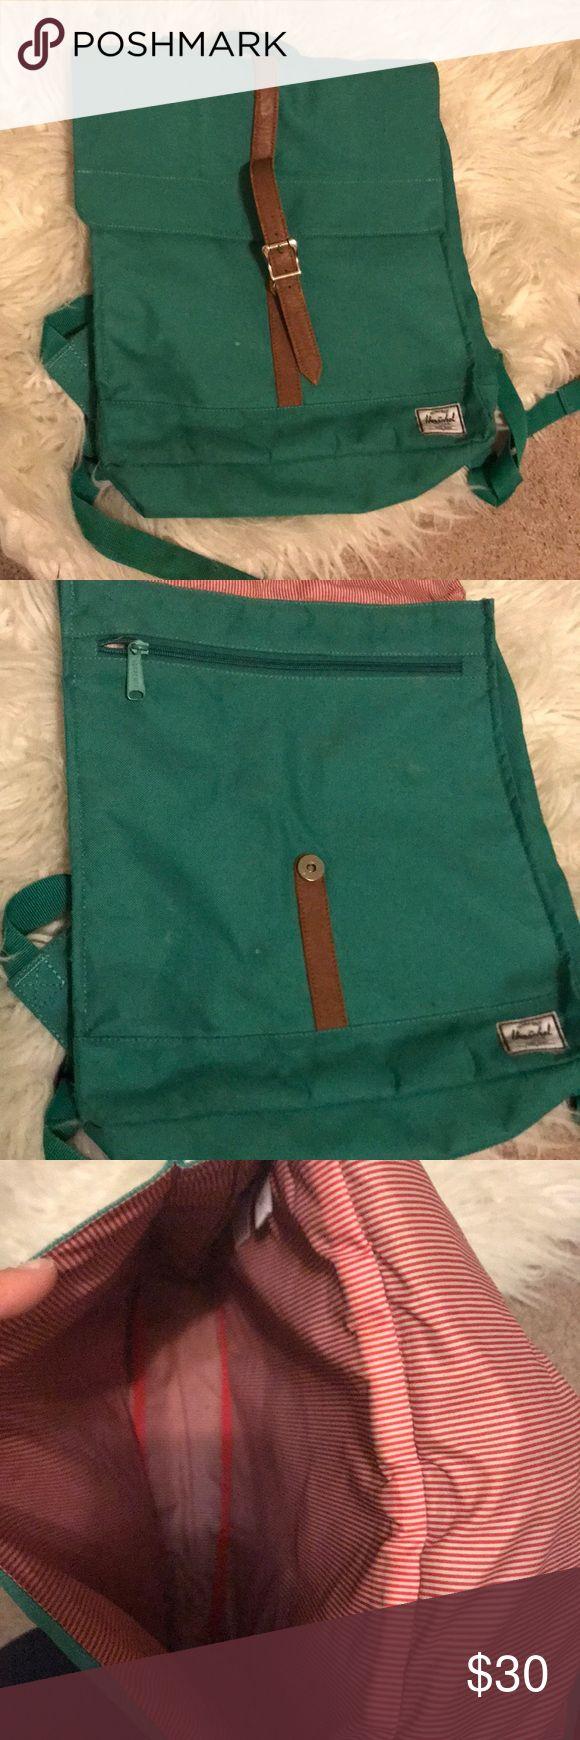 Herschel backpack Green/teal color. Well loved Herschel Supply Company Bags Backpacks